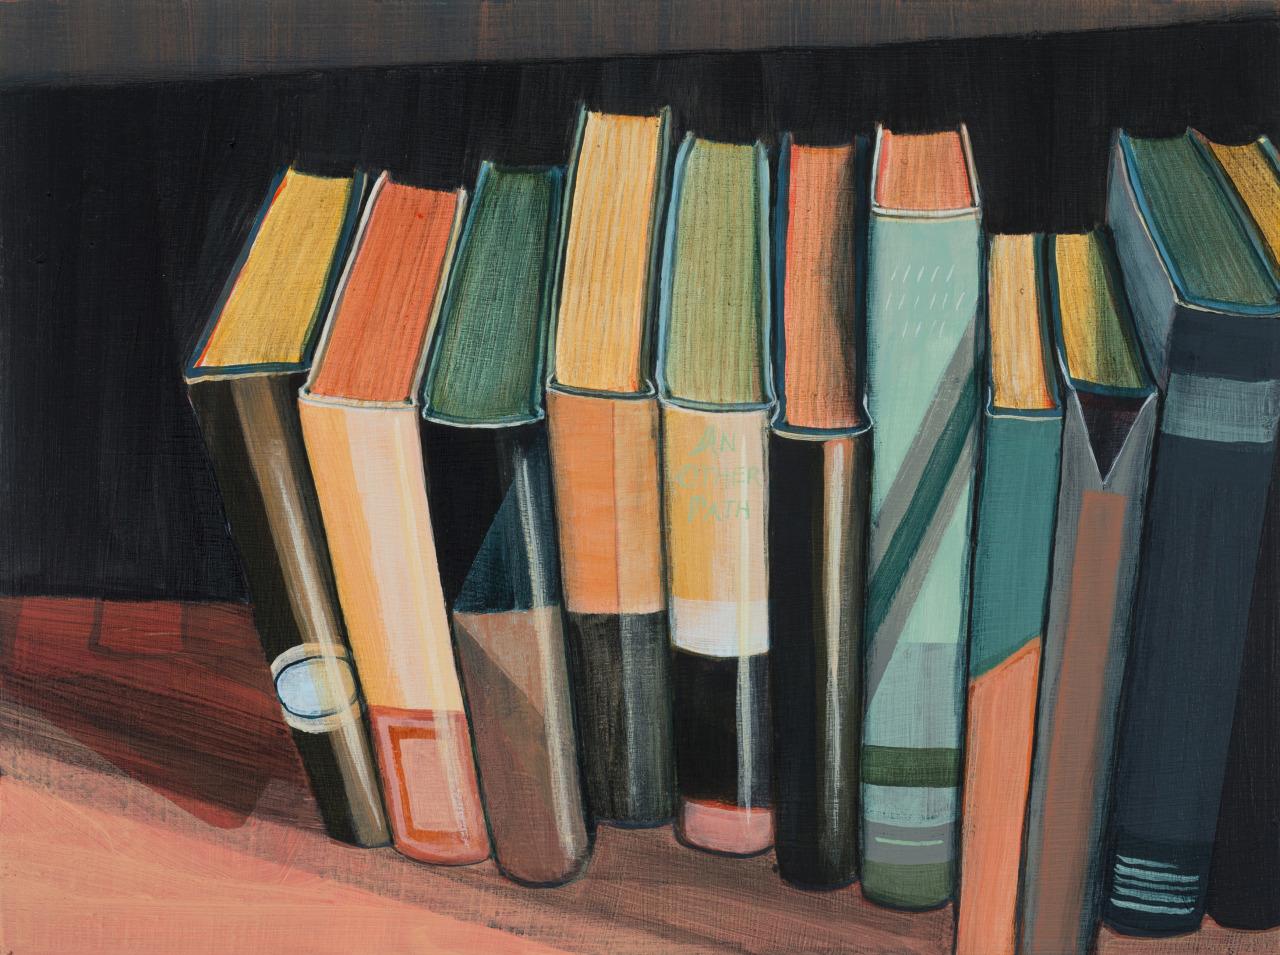 Jordan Buschur, Options Open, (Nebraska) from ART IN AMERICA